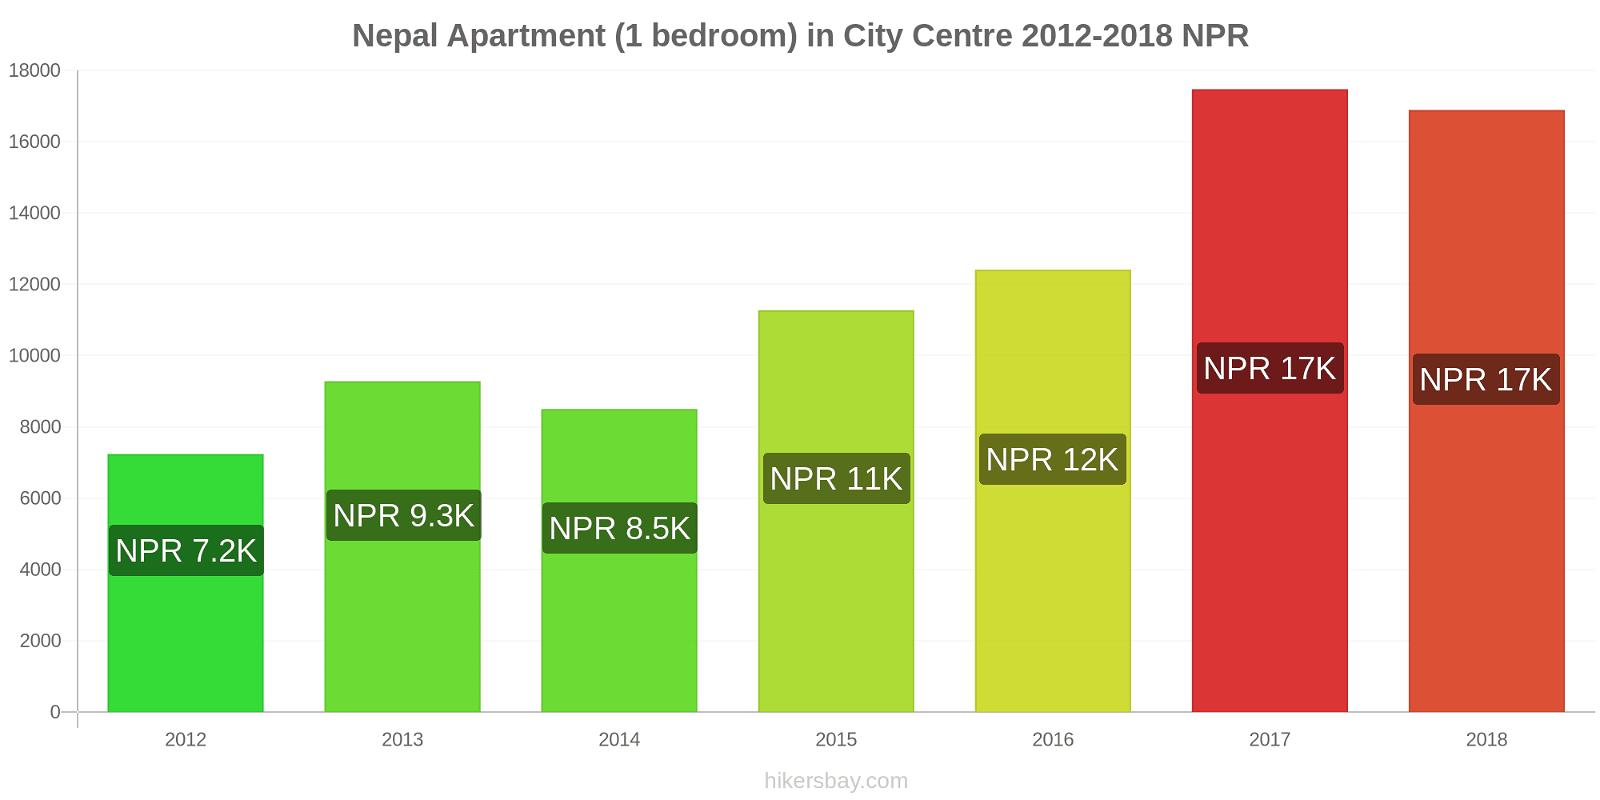 Nepal price changes Apartment (1 bedroom) in City Centre hikersbay.com